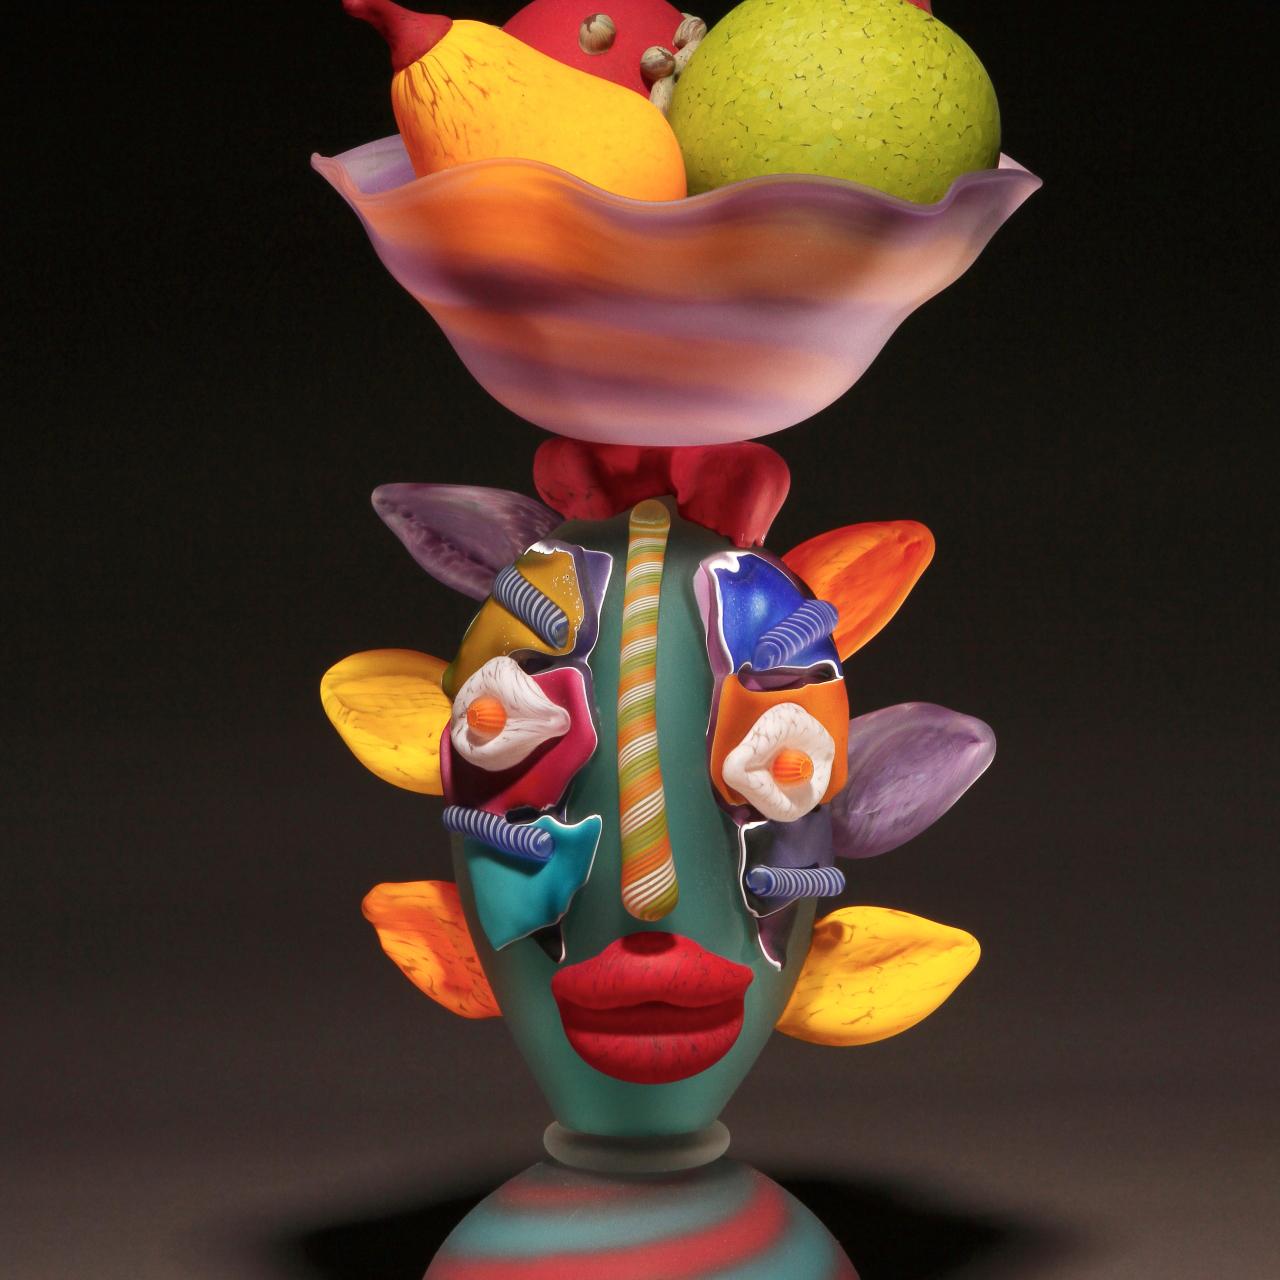 James Wilbat - Woman with Fruit Basket